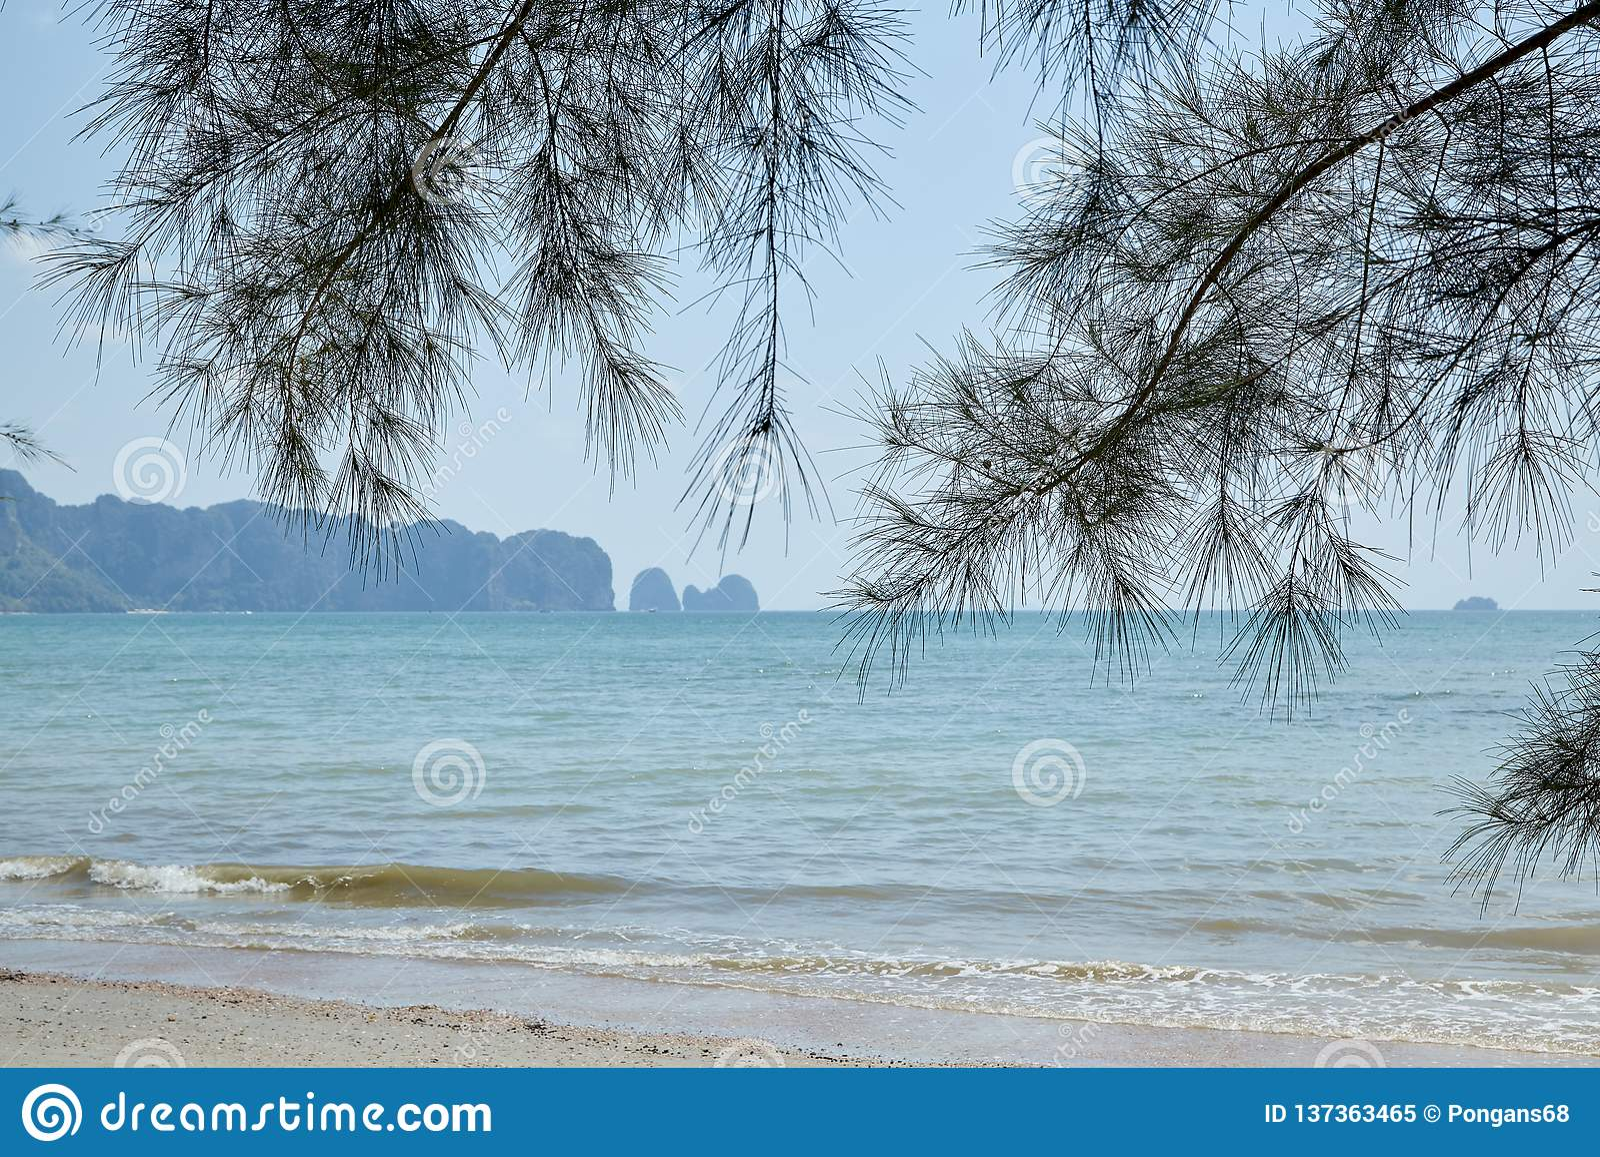 Summer travel in the Thai sea